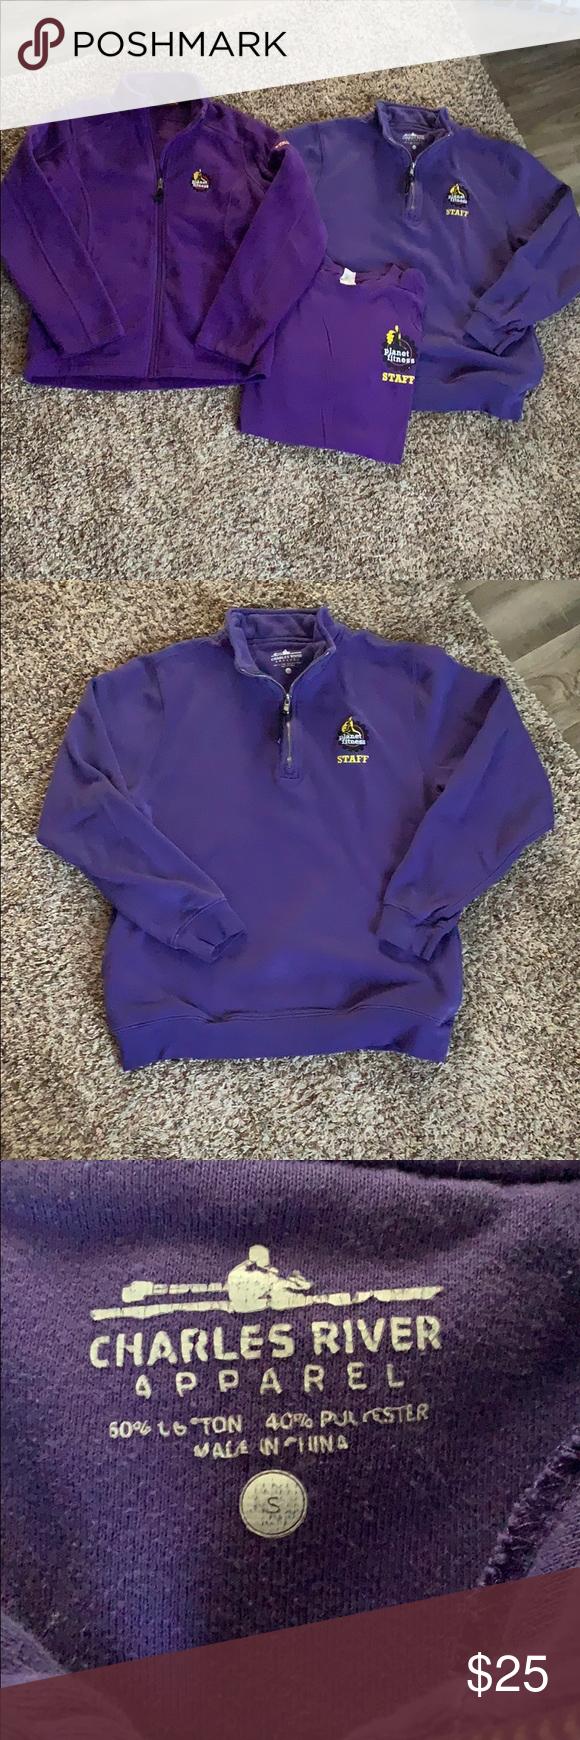 3pc Planet Fitness Uniform Planet Fitness Workout Sweatshirt Tops Fleece Jacket